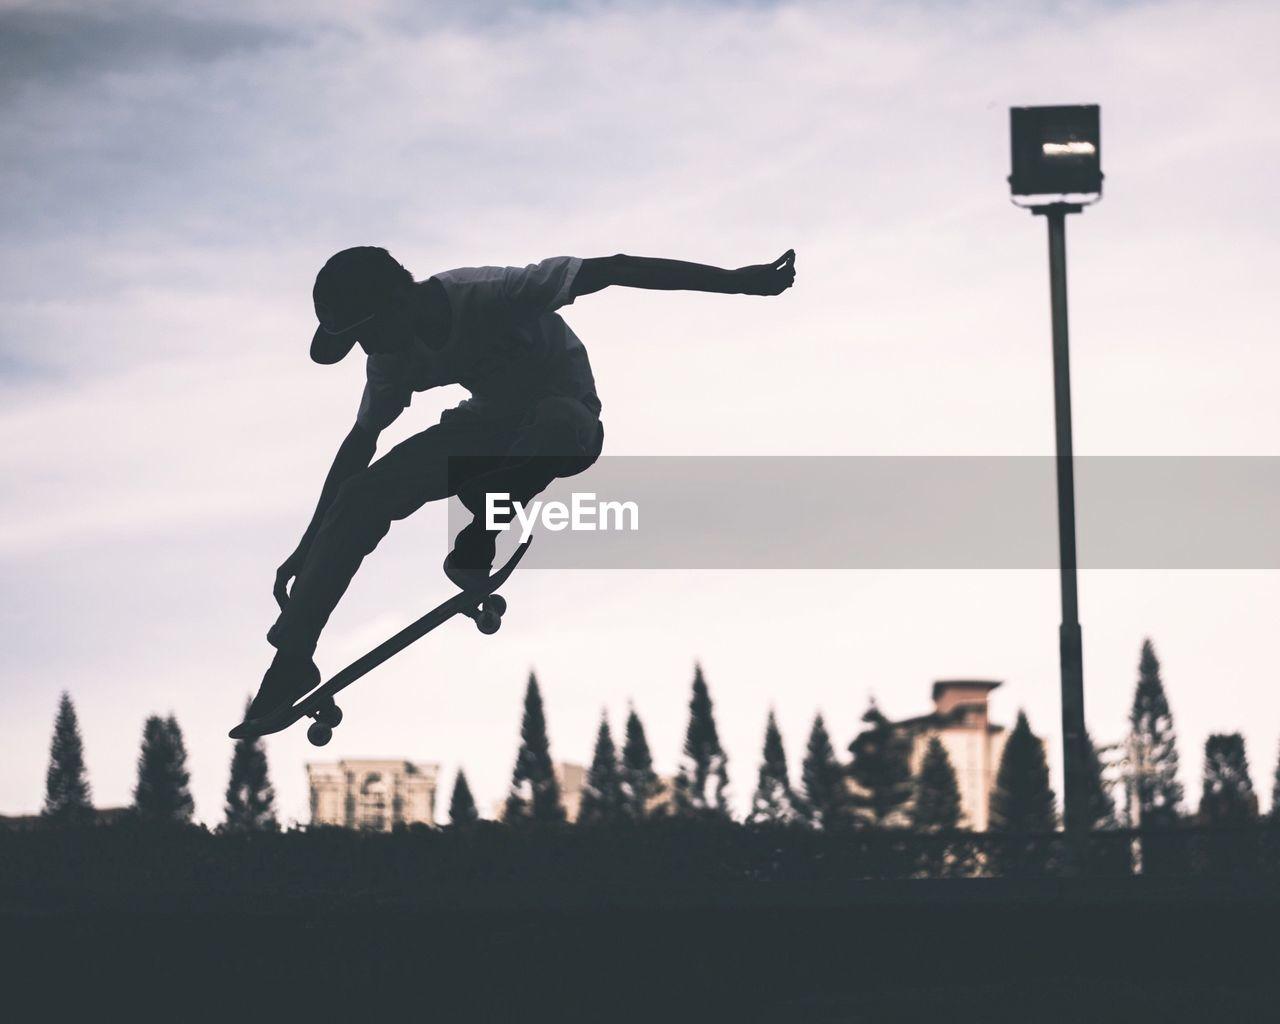 Skateboarder Performing Stunt Against Sky